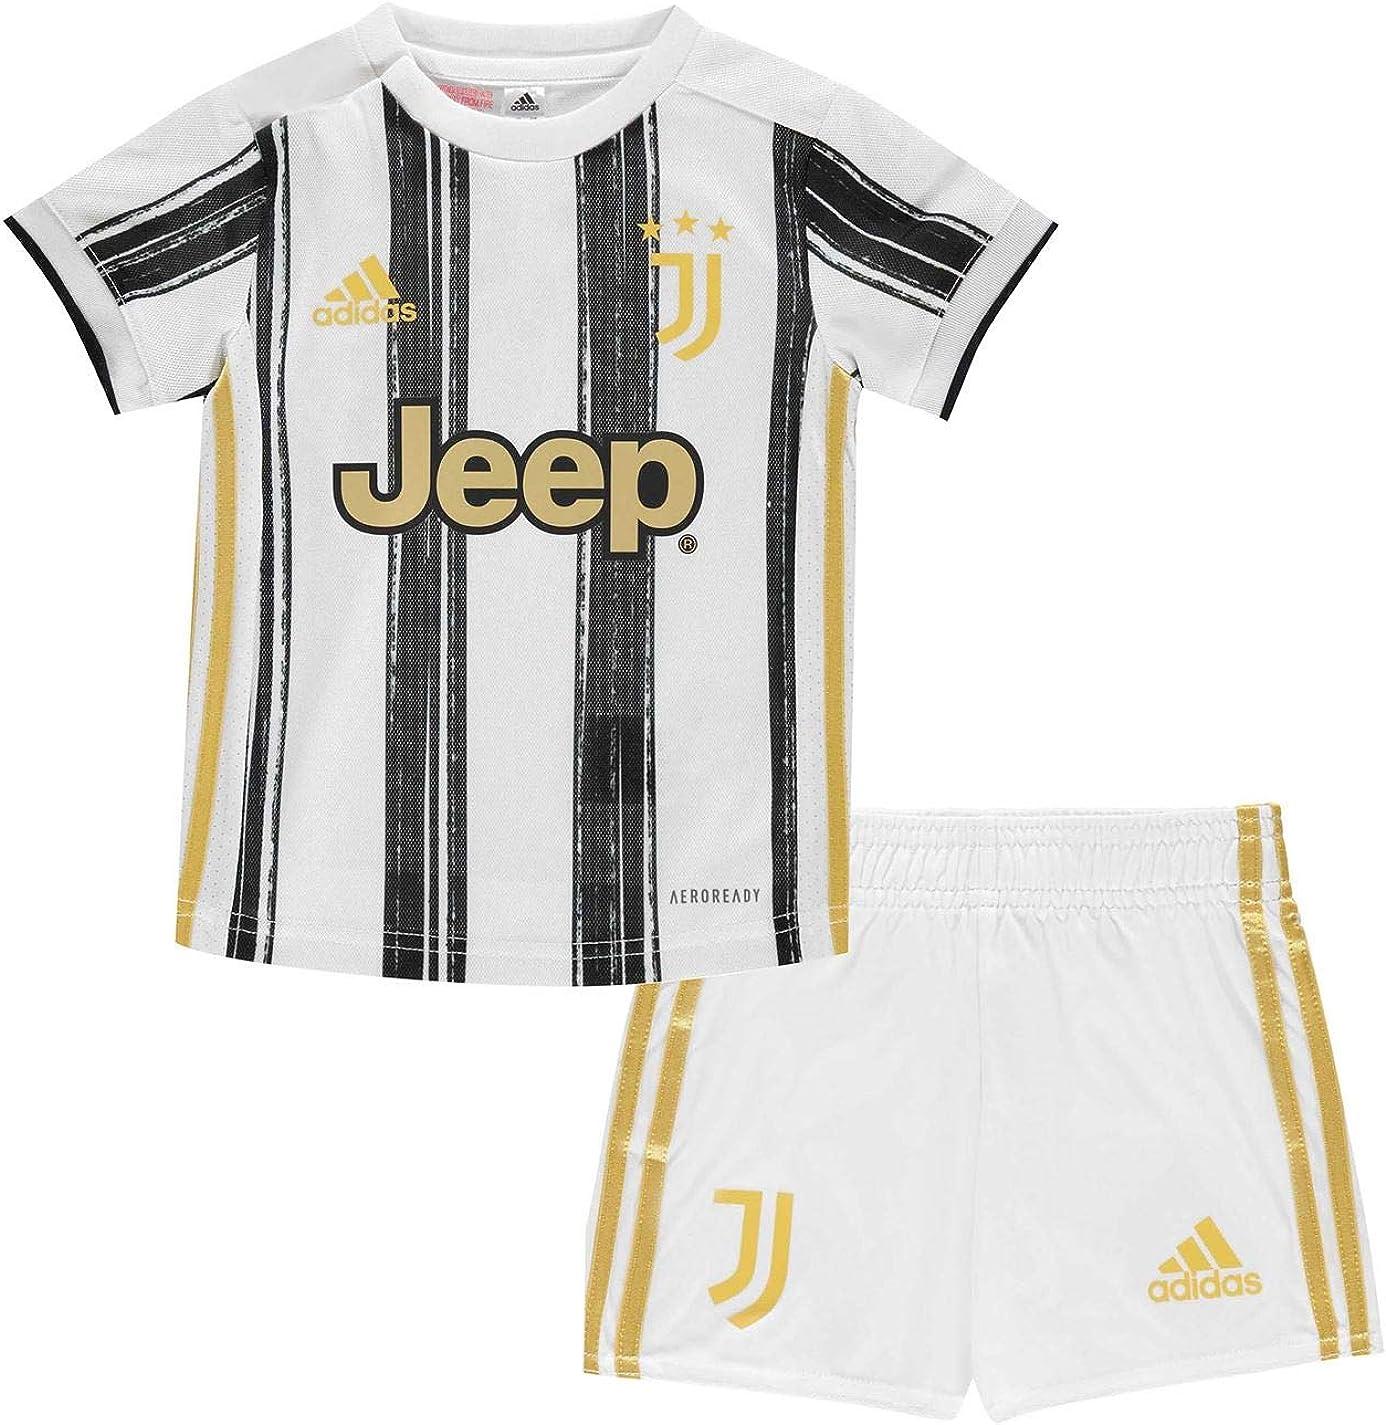 amazon com adidas juventus baby home kit 2020 21 3 6 months white shoes amazon com